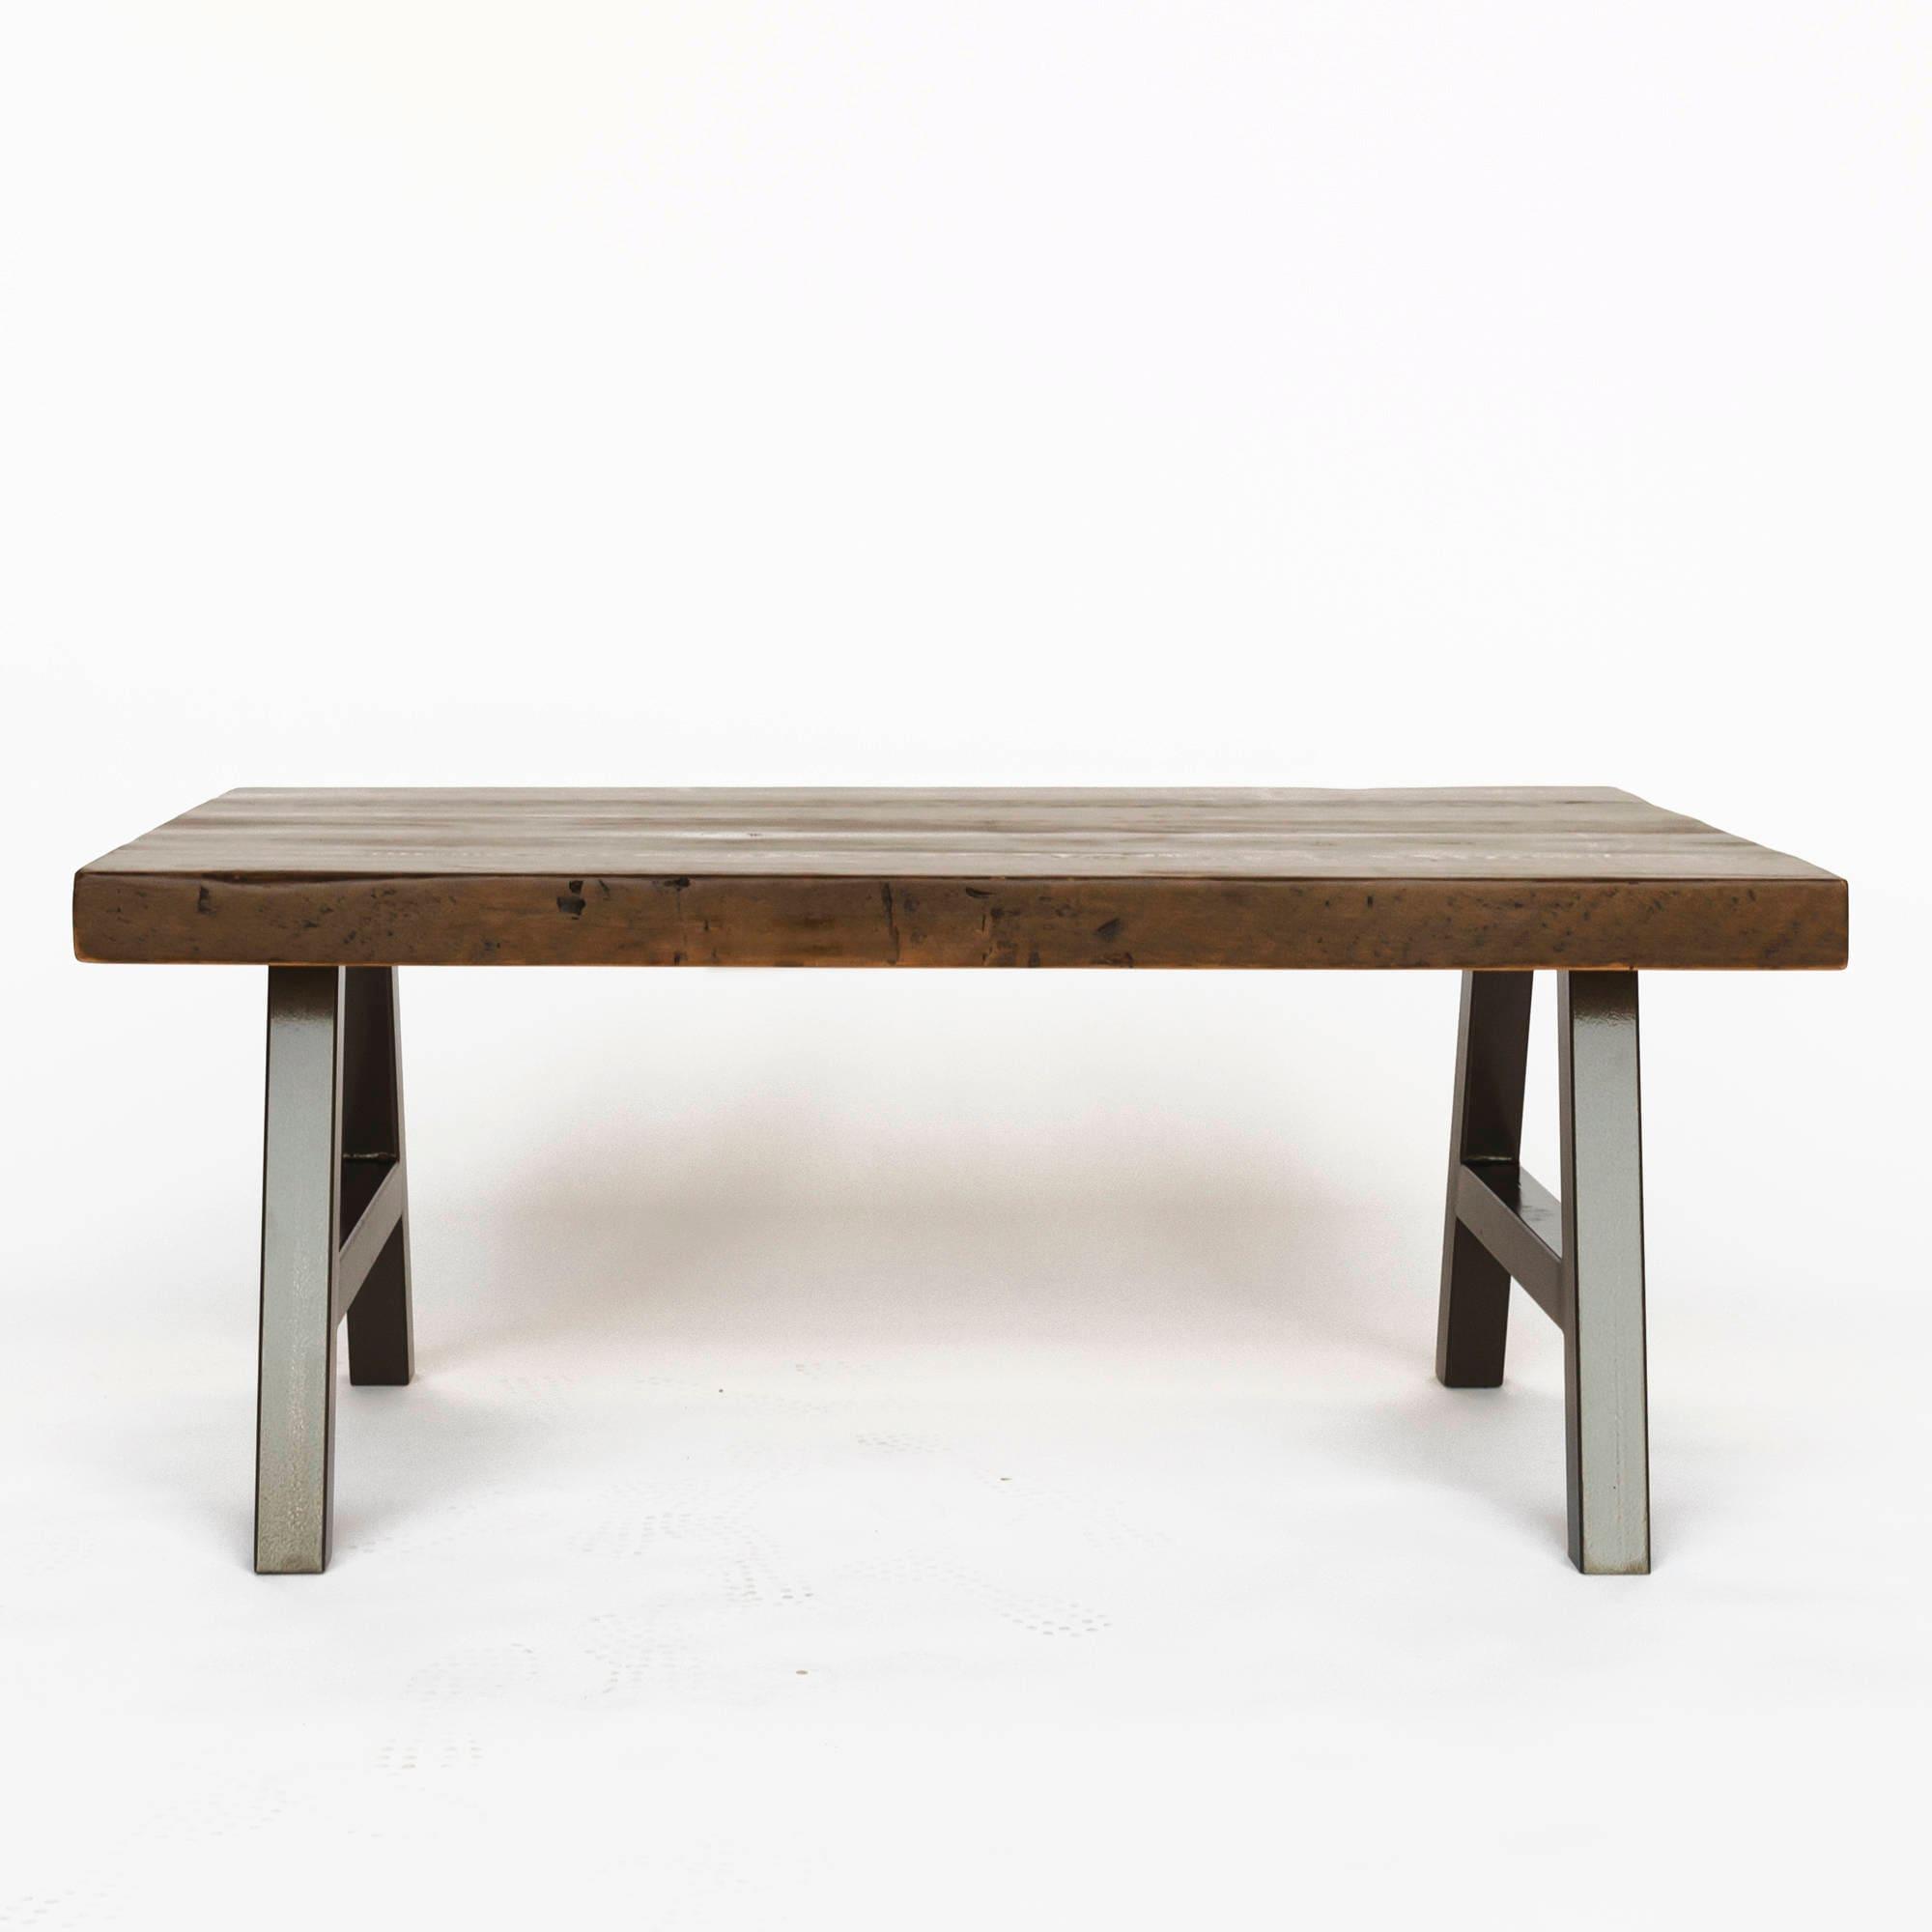 Make A Reclaimed Wood Coffee Table: Farmhouse Coffee Table Made Of Reclaimed Wood And Steel A